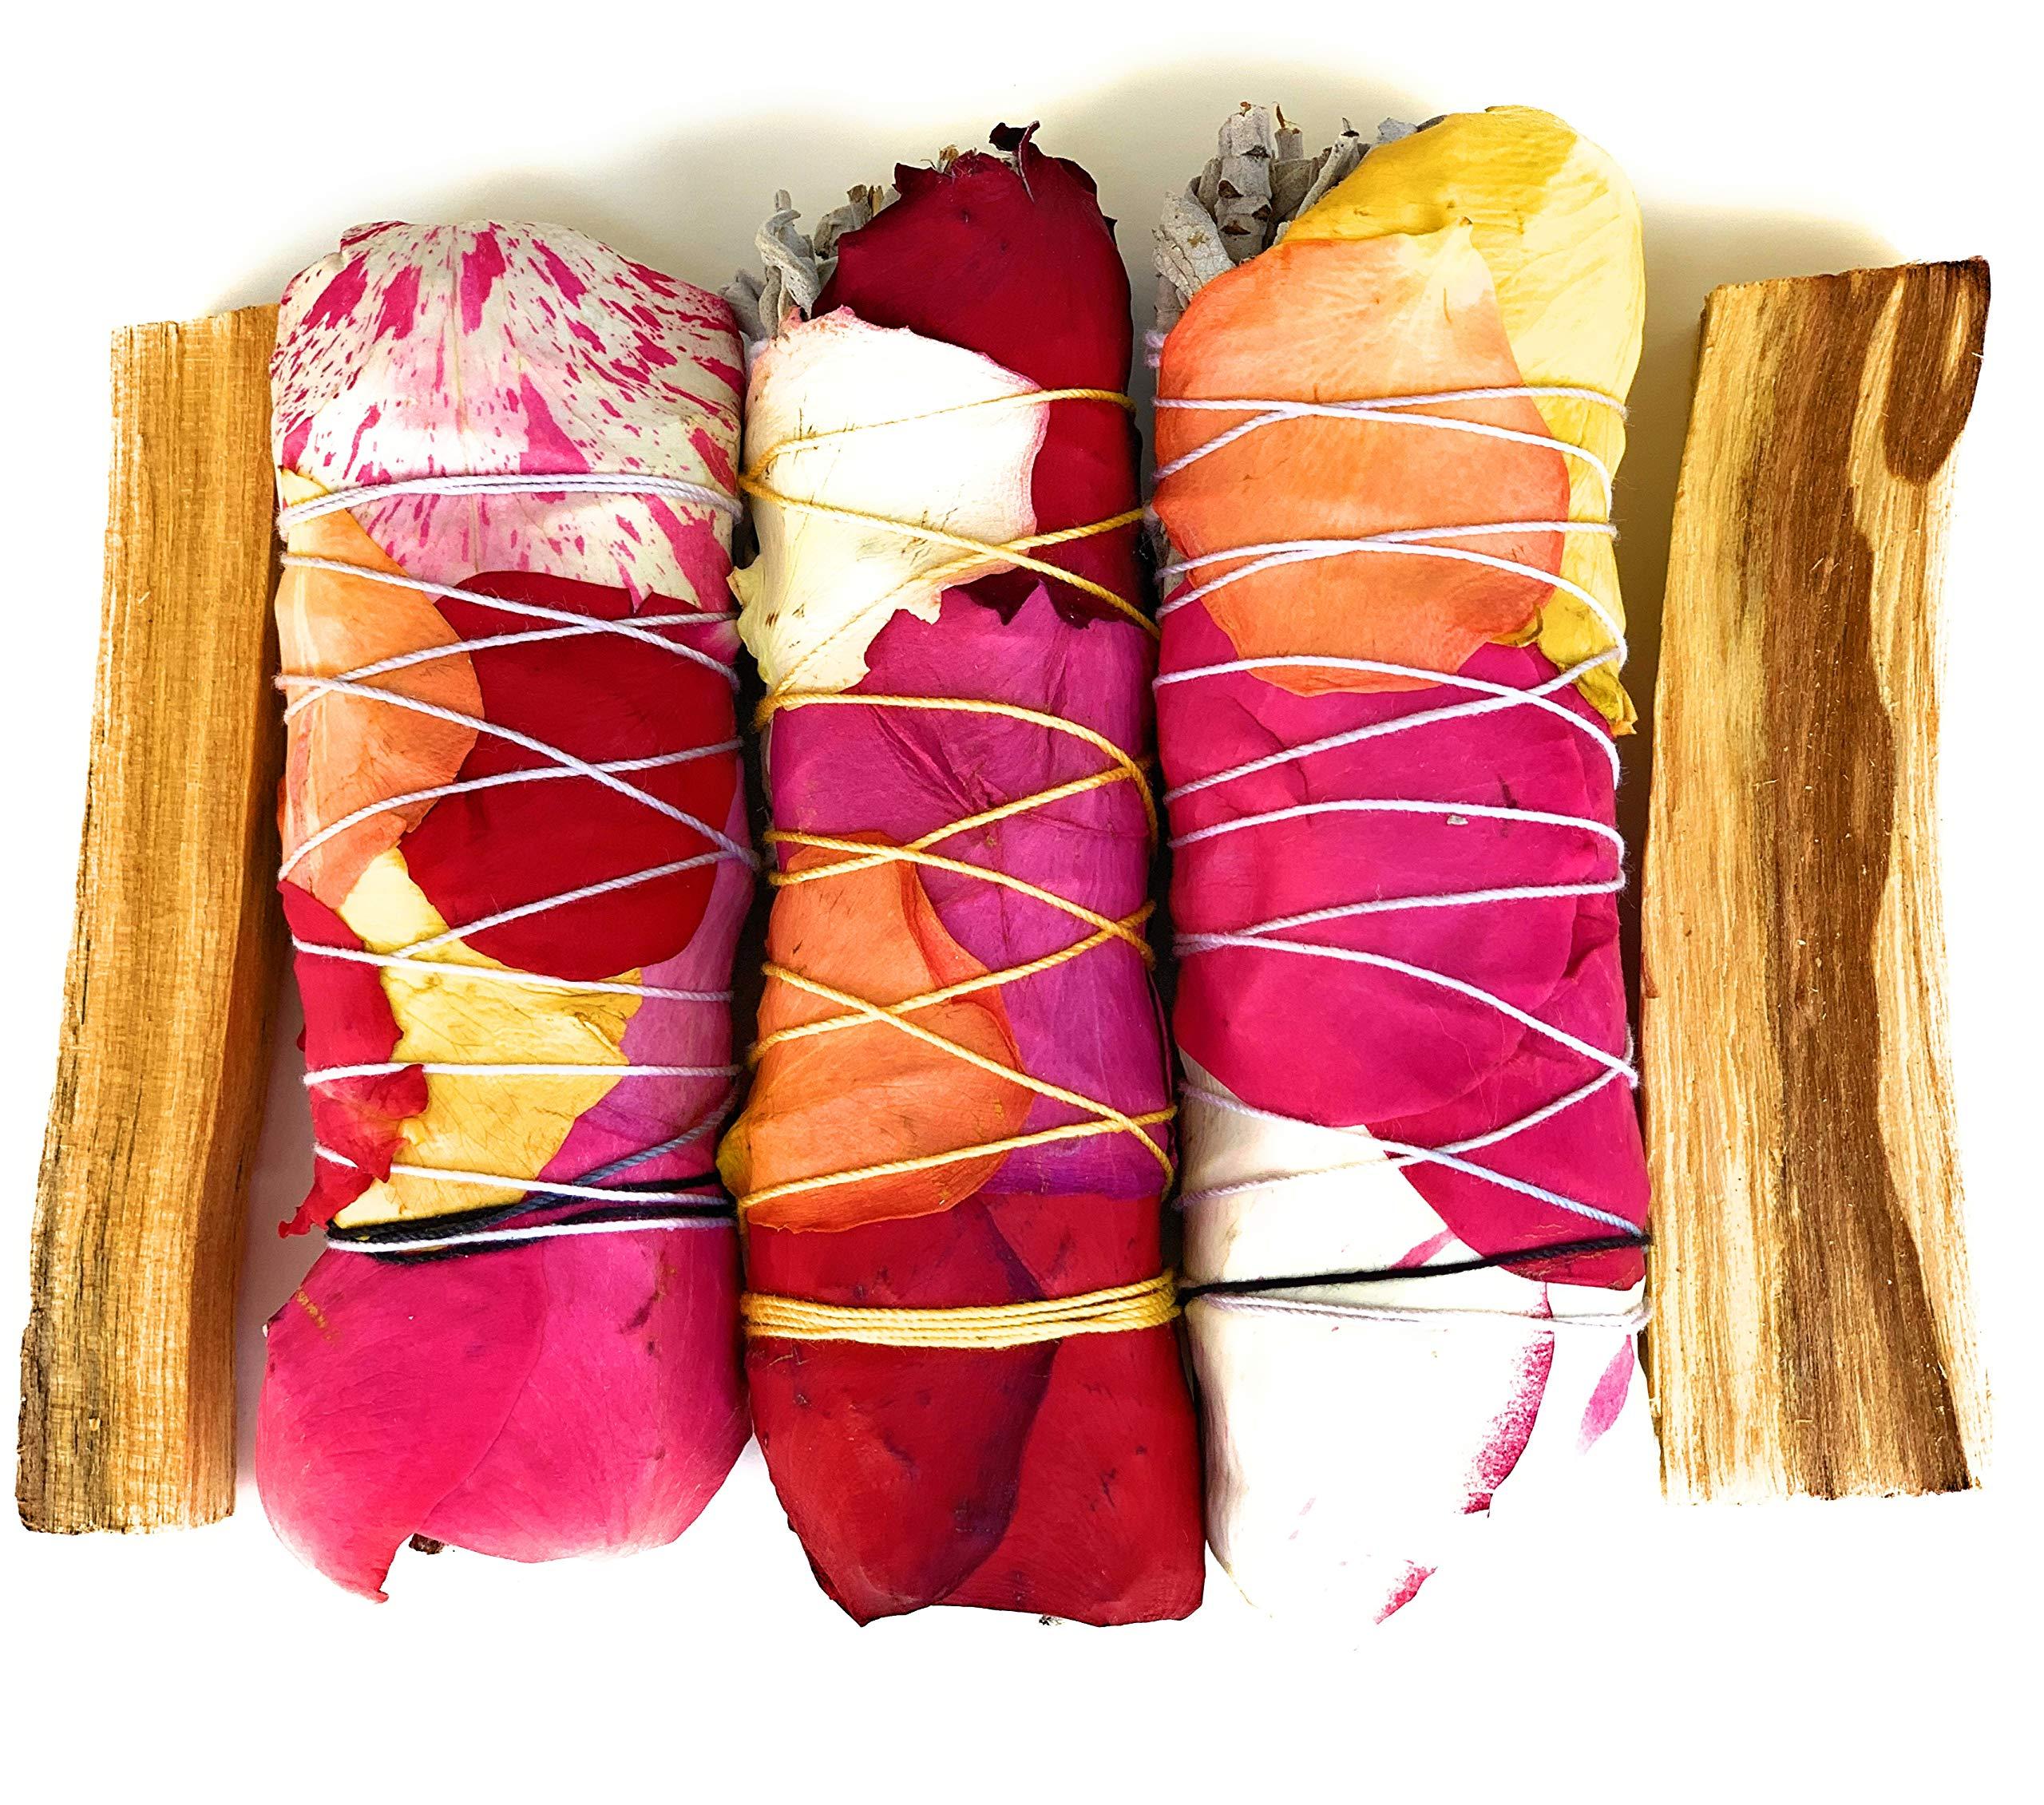 MAMA WUNDERBAR Sage Bundles White Sage and Palo Santo Handmade Smudge Kit Floral Sage Sticks